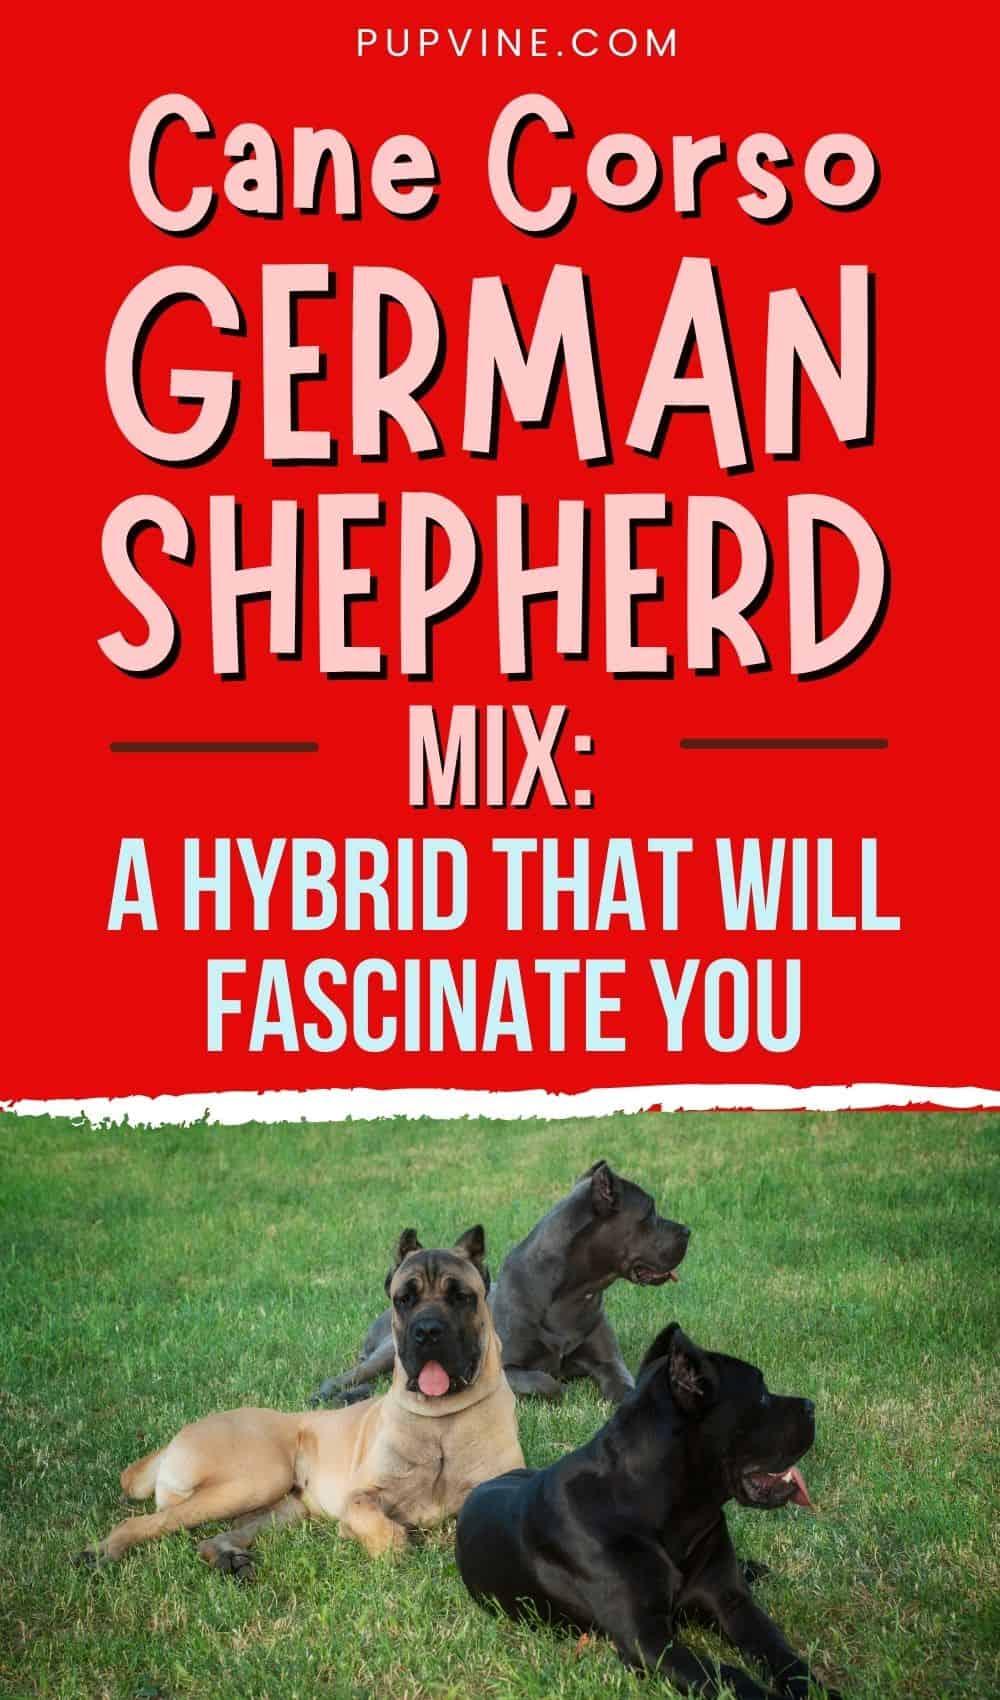 Cane Corso German Shepherd Mix A Hybrid That Will Fascinate You